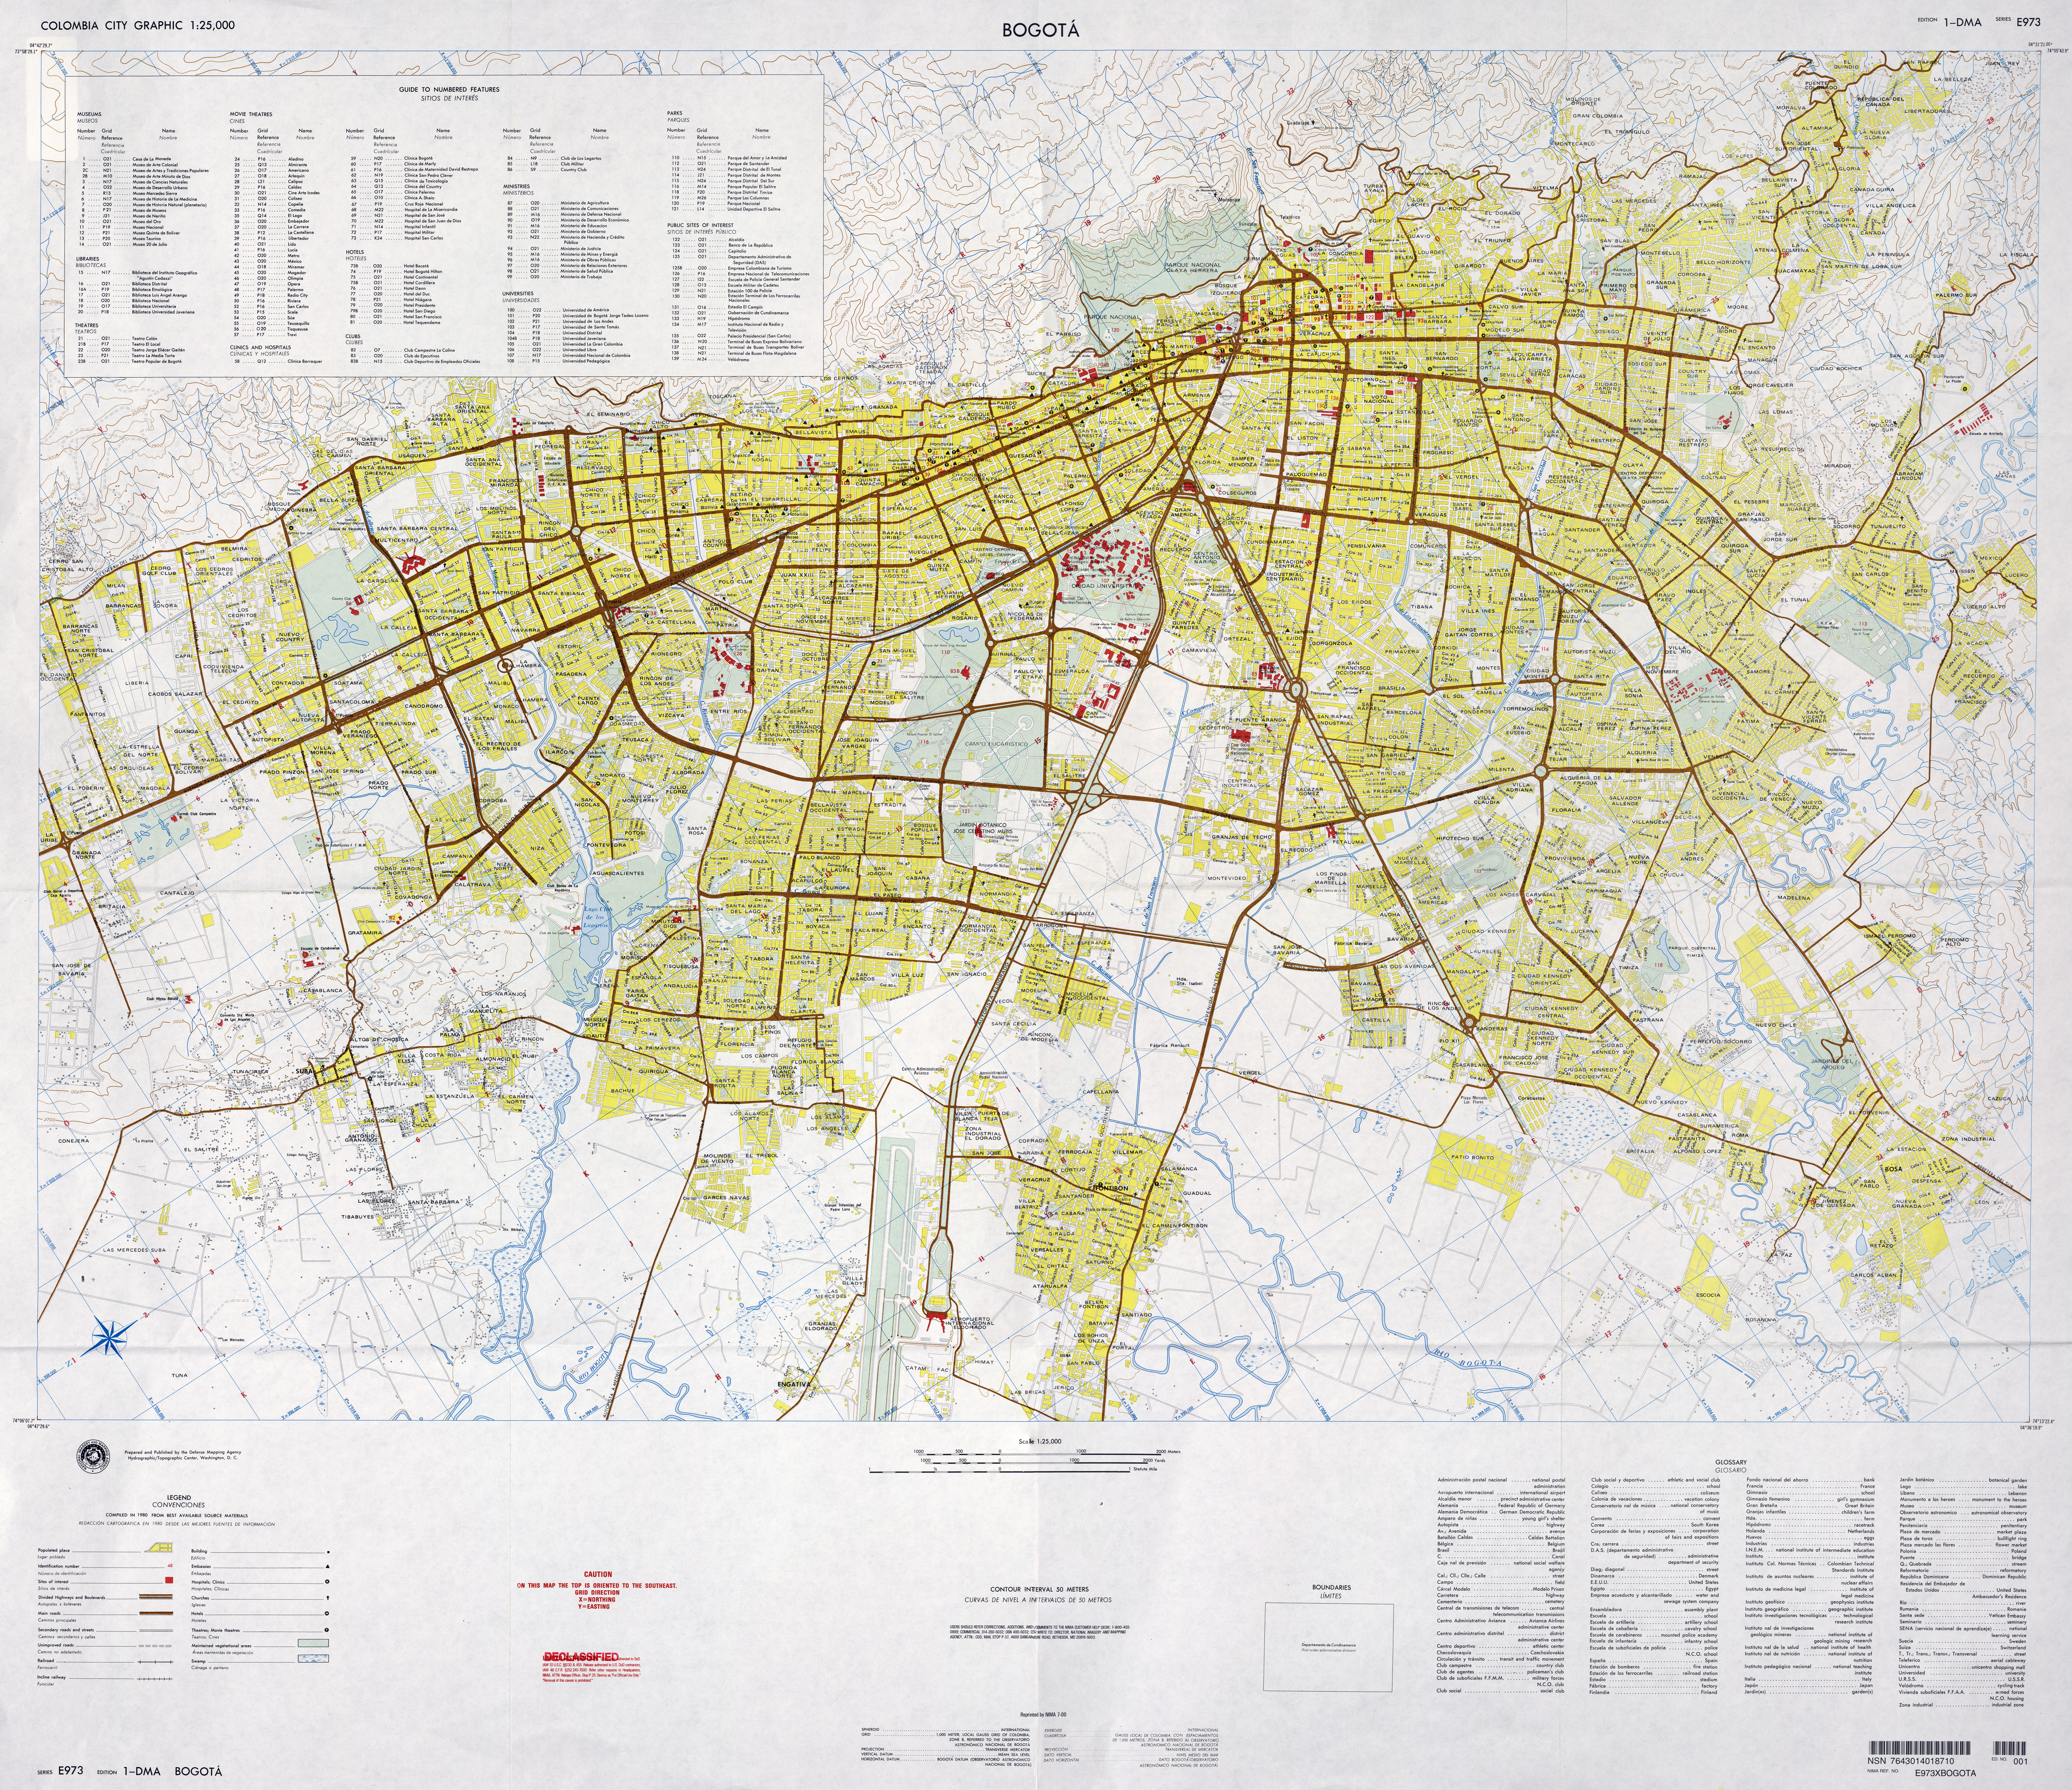 mapa bogota 1960